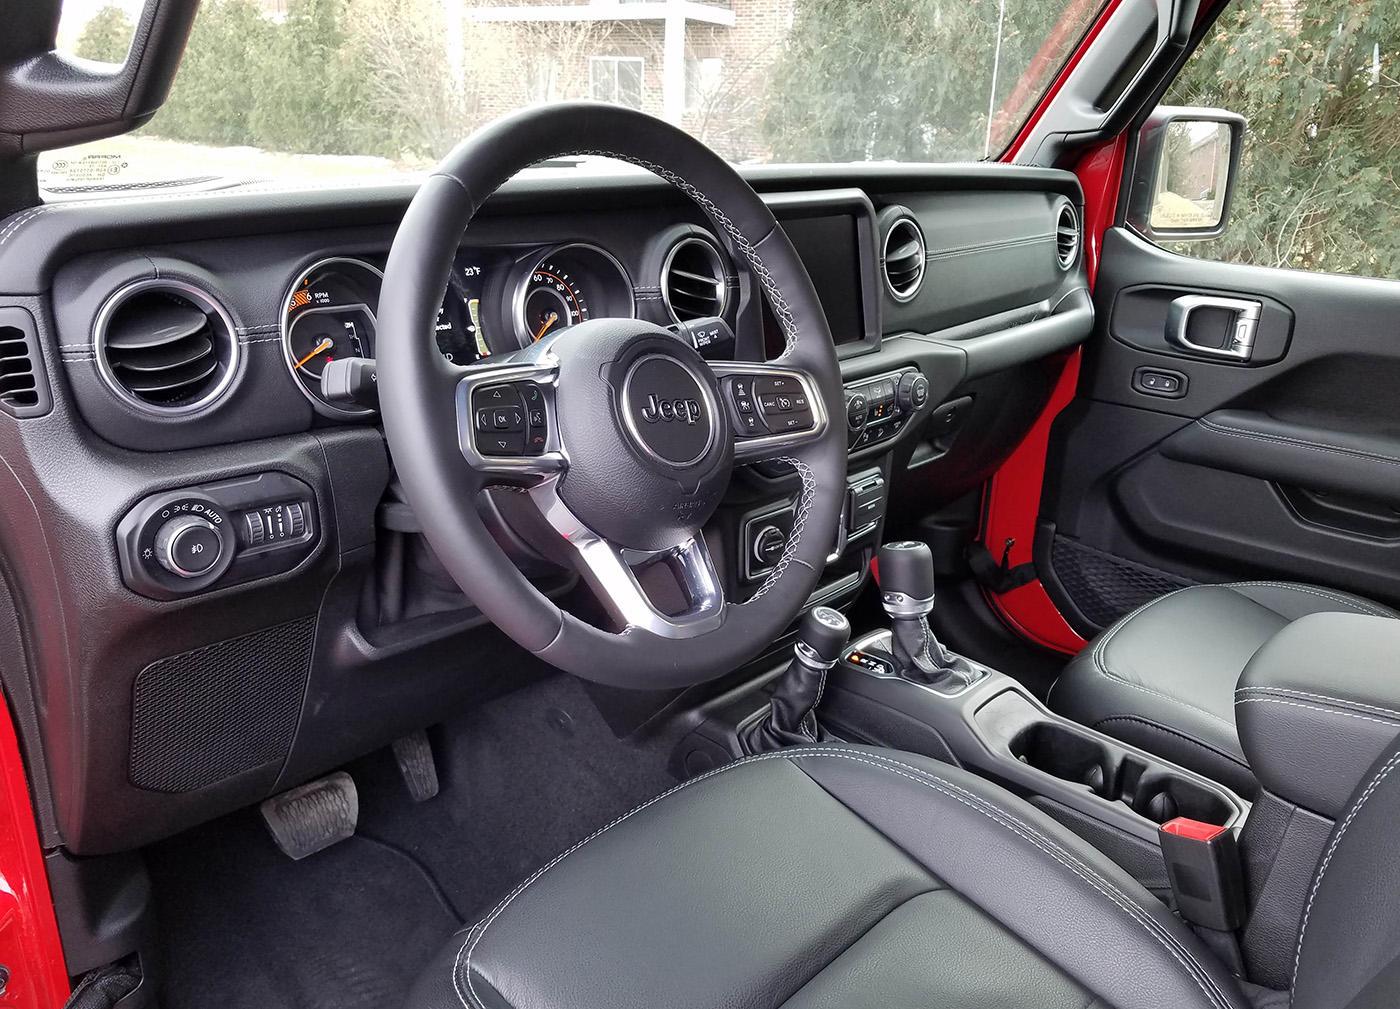 2020 Jeep Wrangler Unlimited Sahara 4x4 Review Wuwm